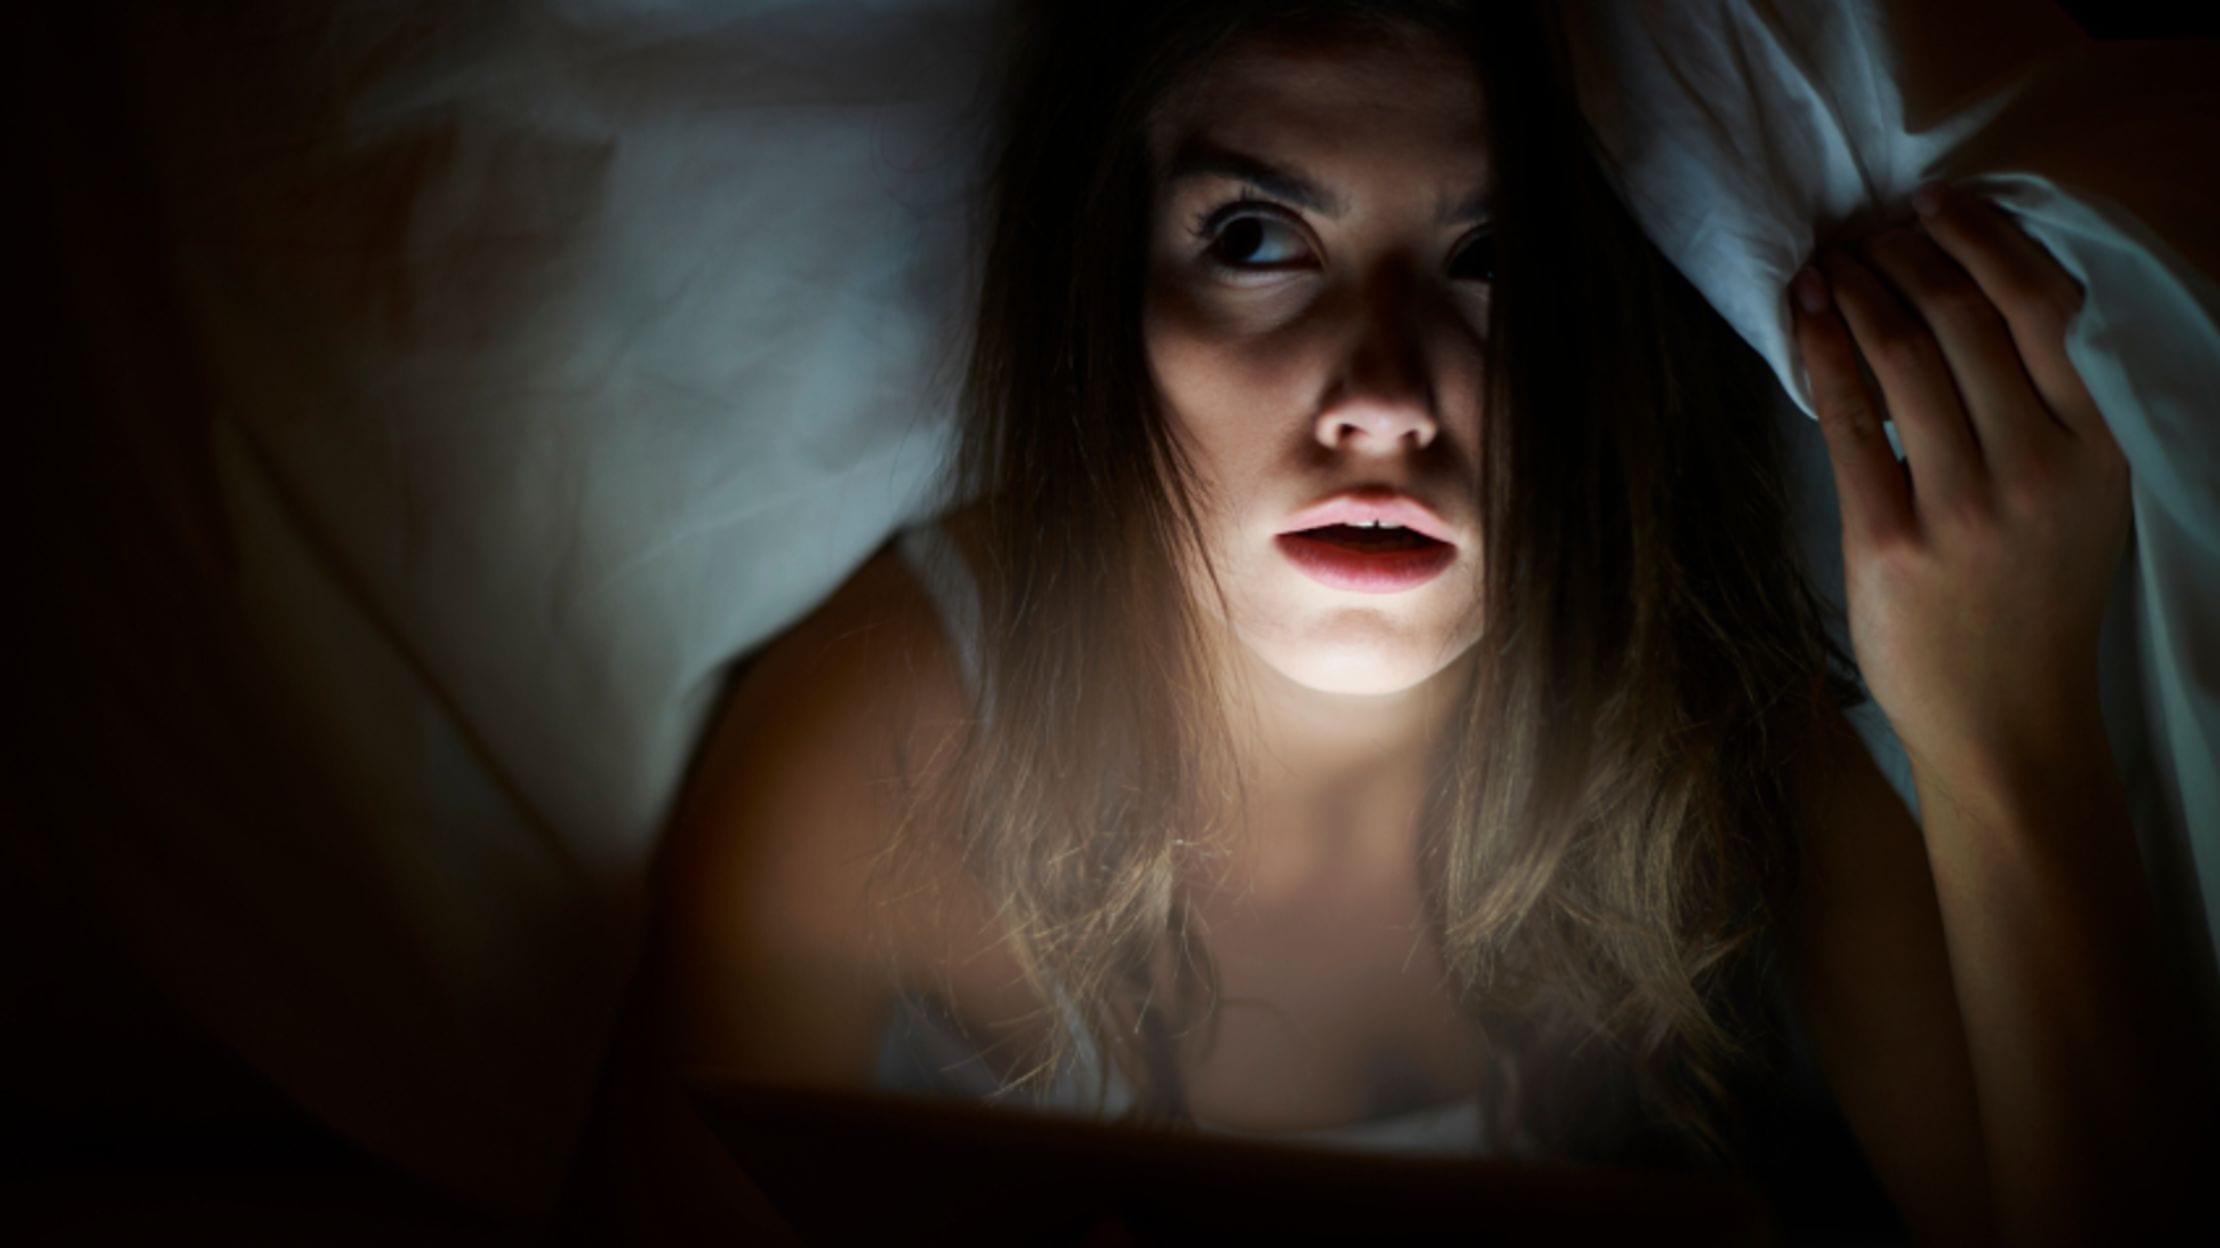 Parasomnia sleep disorder description by dailysleep.org